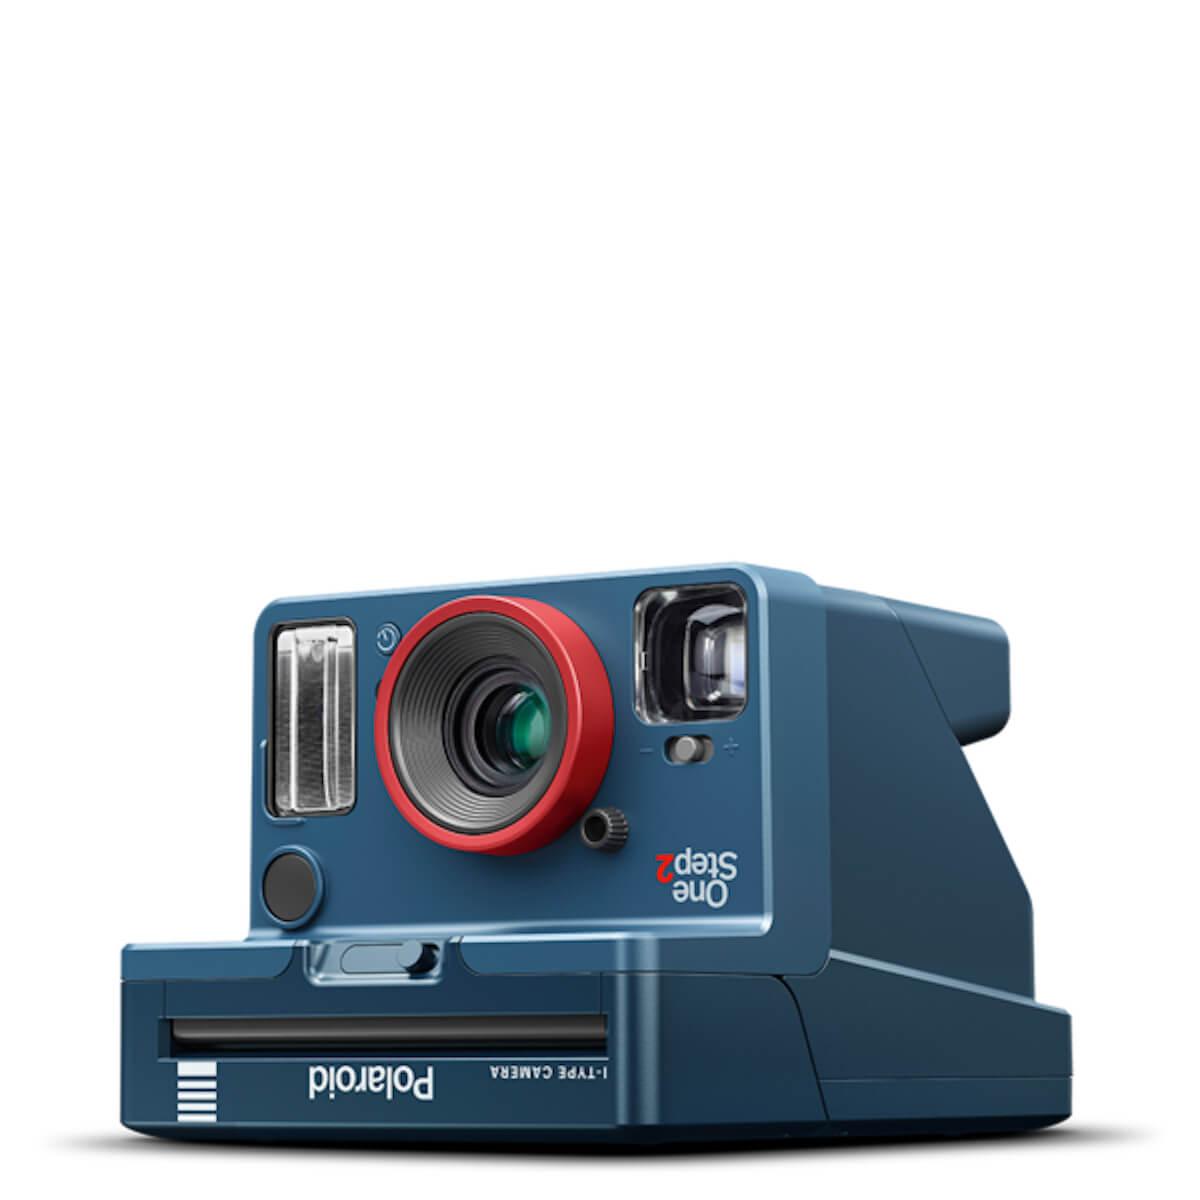 Netflix『ストレンジャー・シングス』のポラロイドカメラがかわいい!Polaroid Originalsとのコラボアイテムが発売 life190606_strangerthings_onestep_7